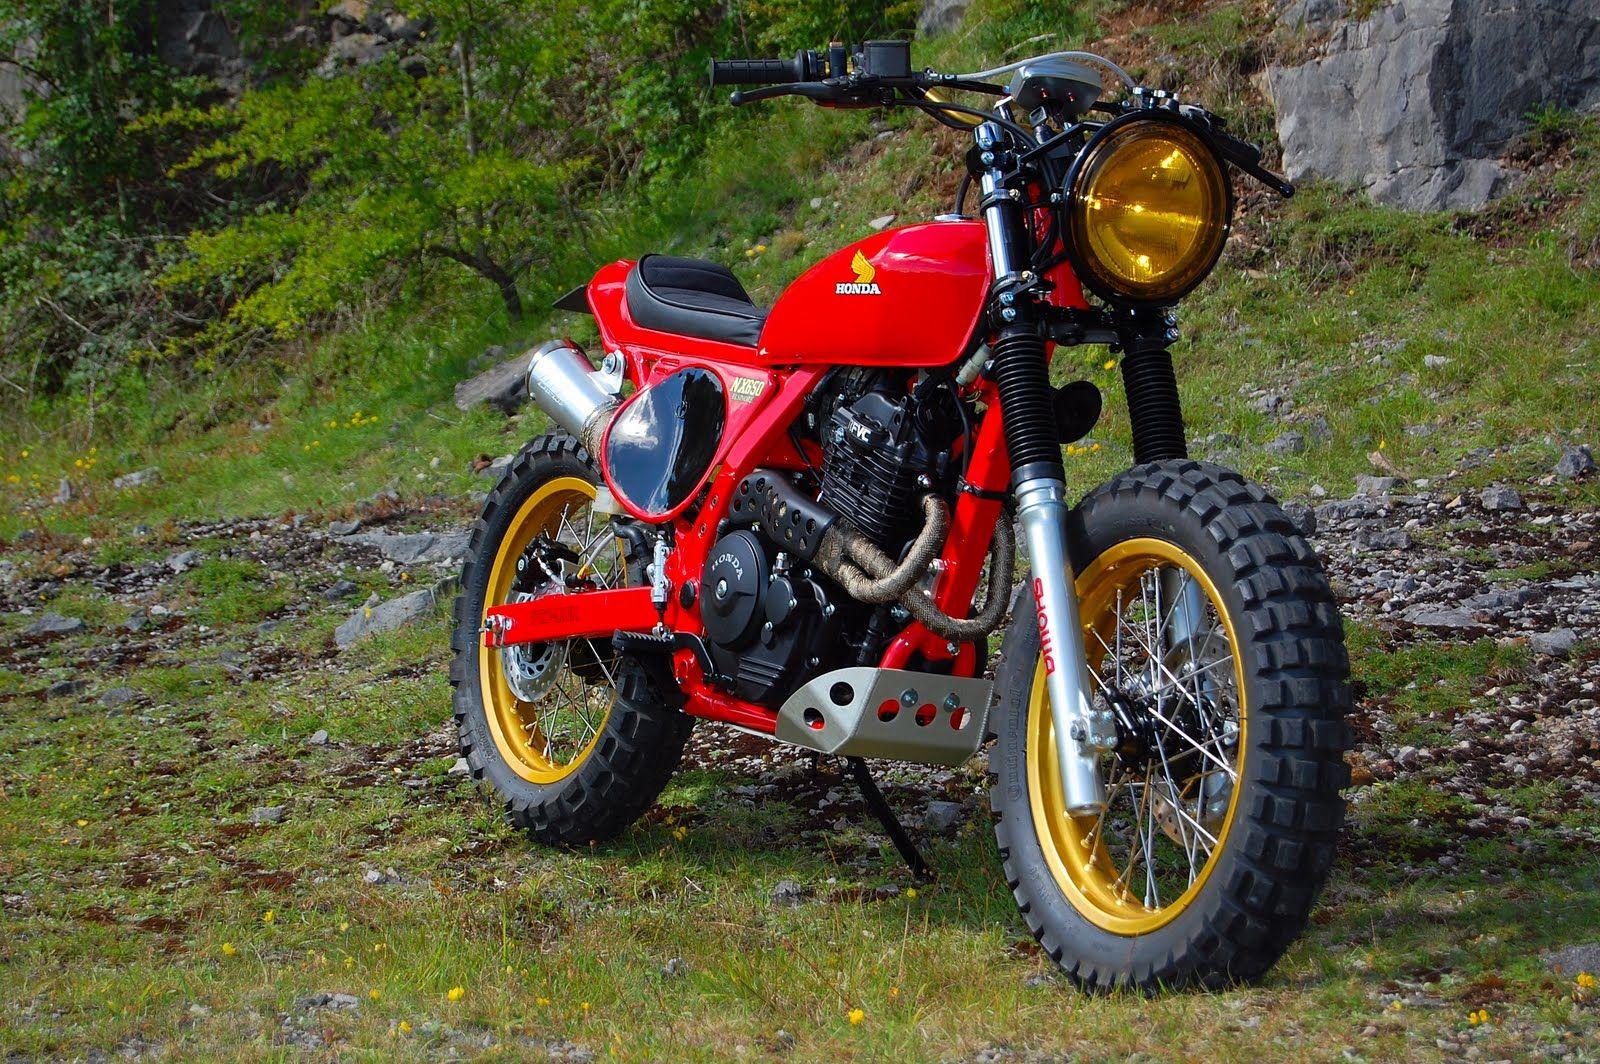 http://www.daranok.com/images/2013/09/honda-custom-custom-honda-nx650-dominator-number-3-dirt-bike-with-red-painted-cg125-gas-tank-front-sid...